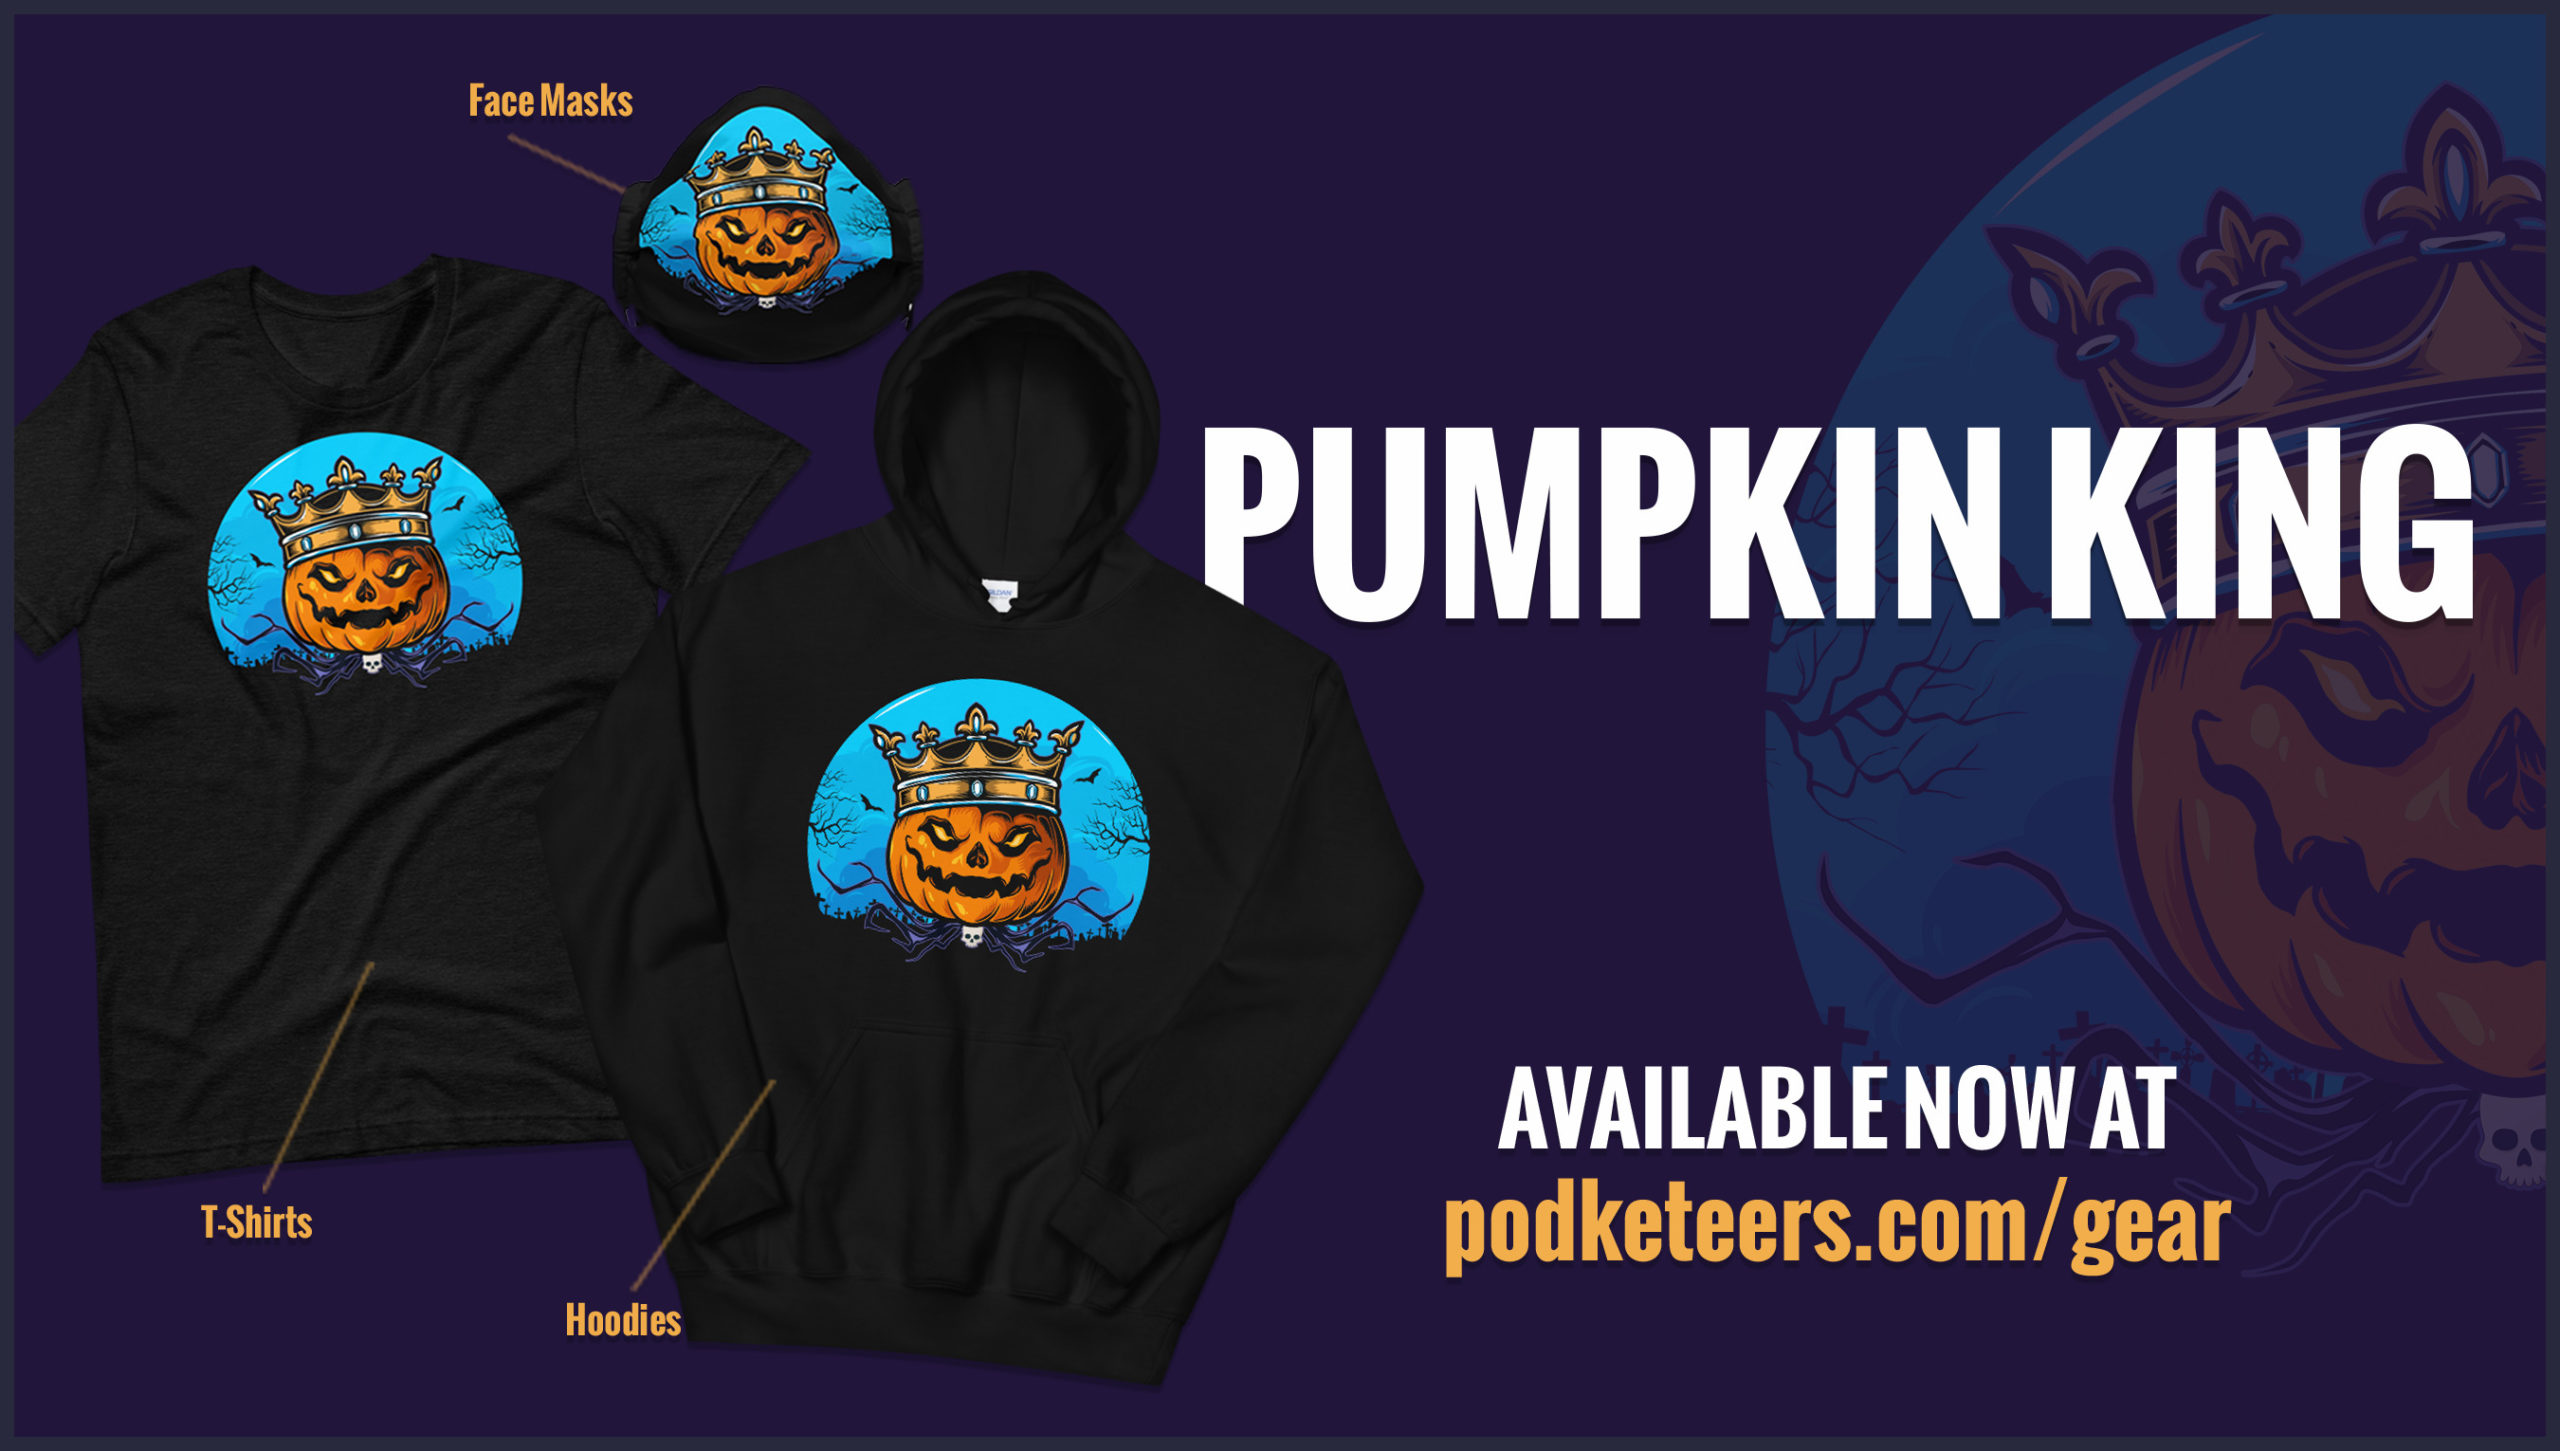 podketeers-gear-pumpkin-king-shirt-face-mask-hoodie